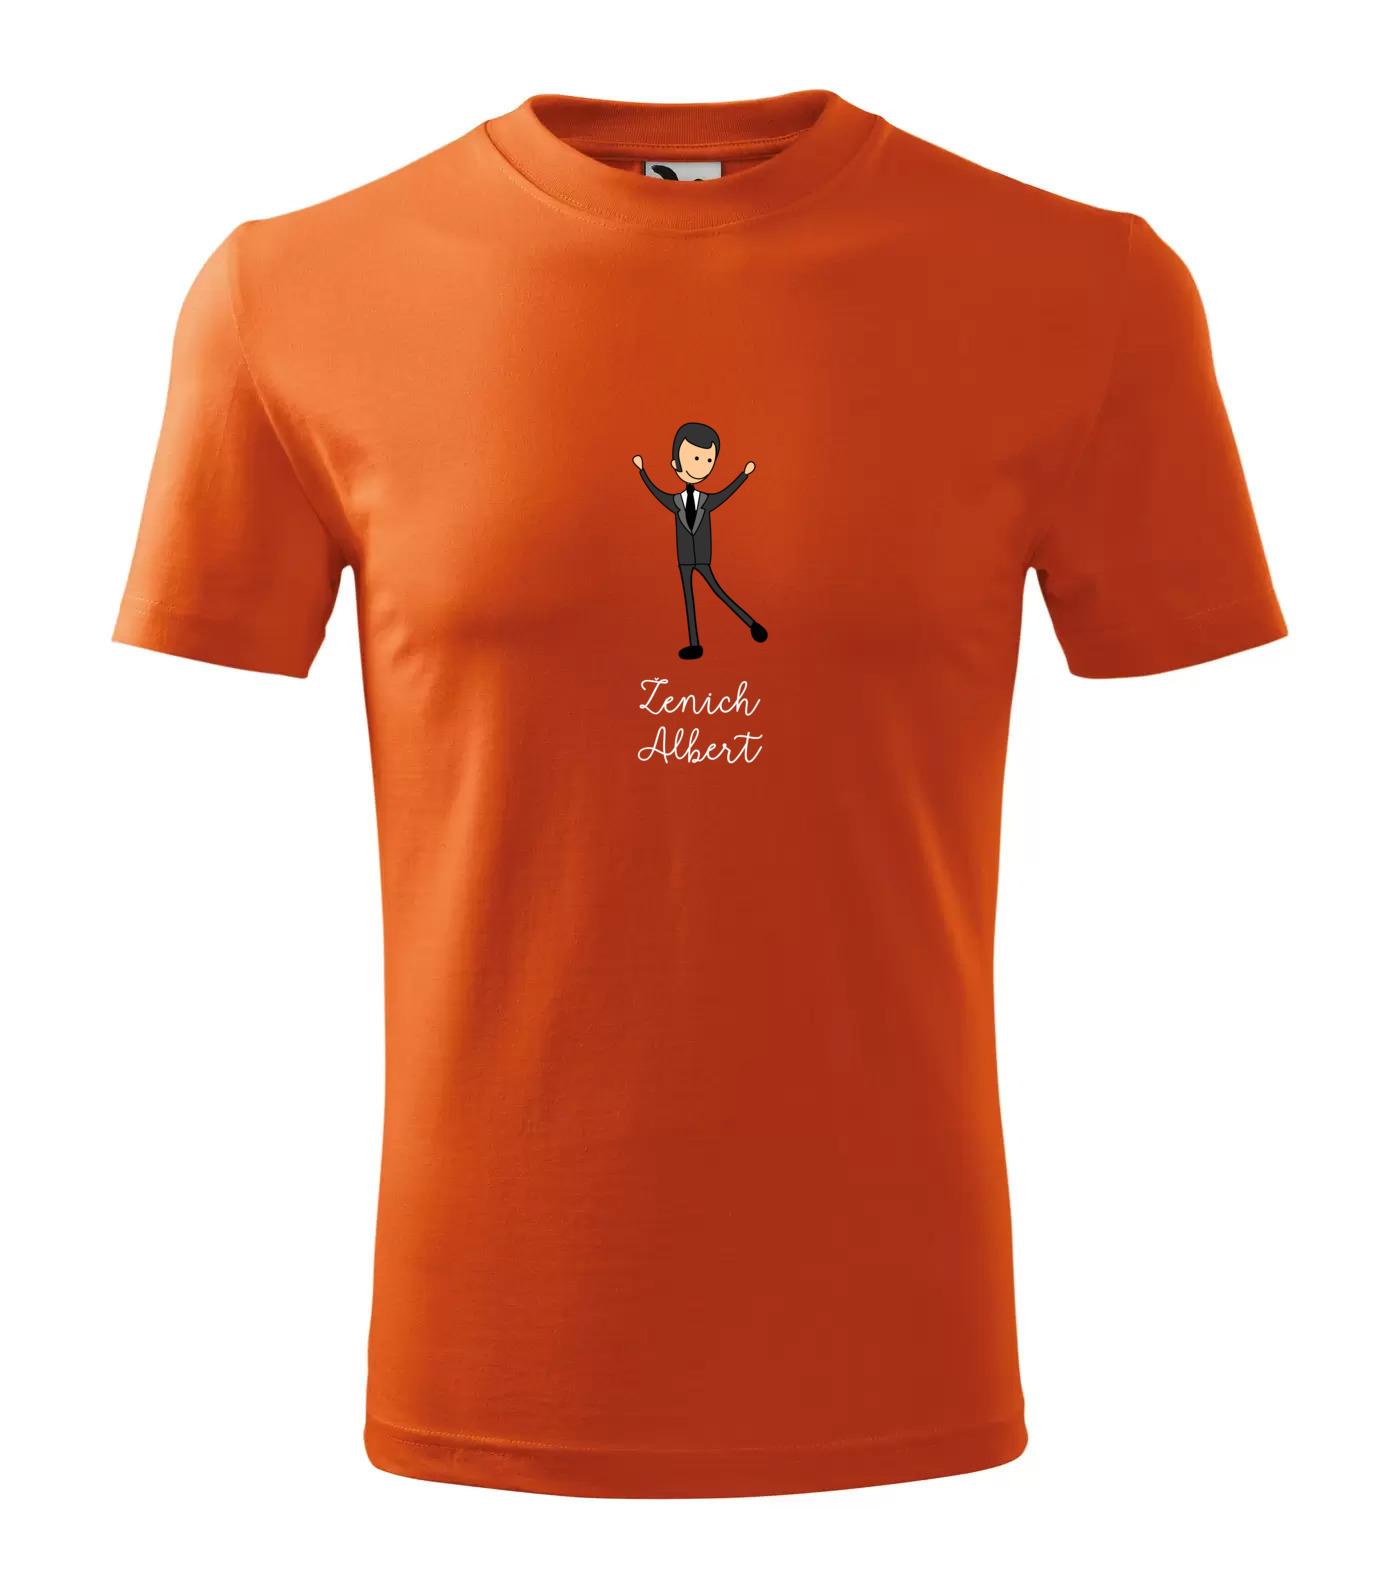 Tričko Ženich Albert